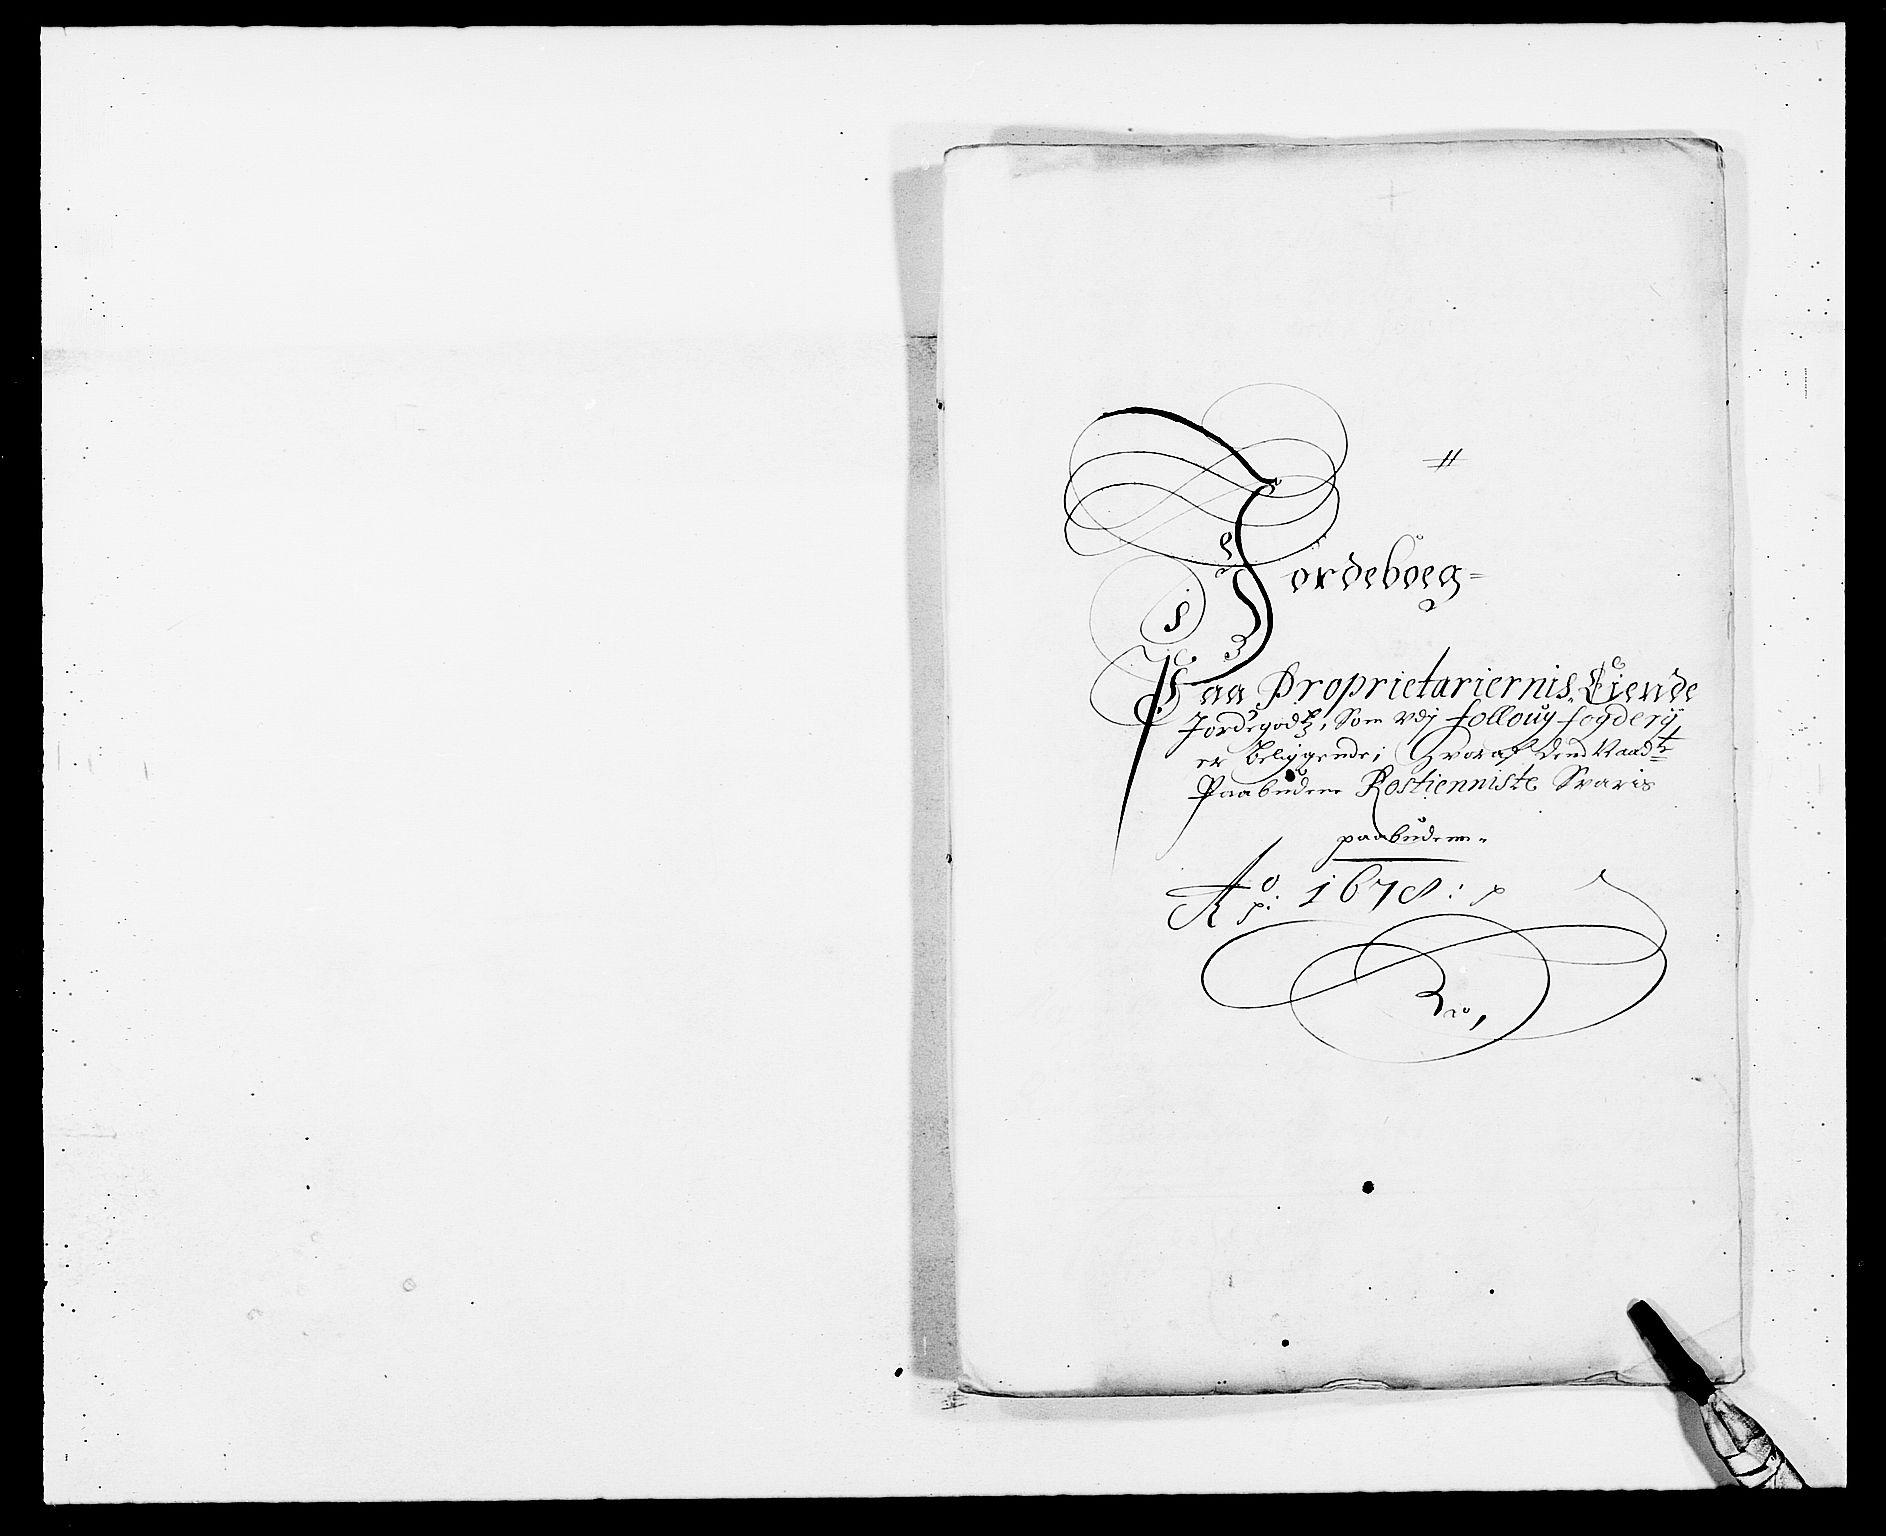 RA, Rentekammeret inntil 1814, Reviderte regnskaper, Fogderegnskap, R09/L0427: Fogderegnskap Follo, 1678, s. 117